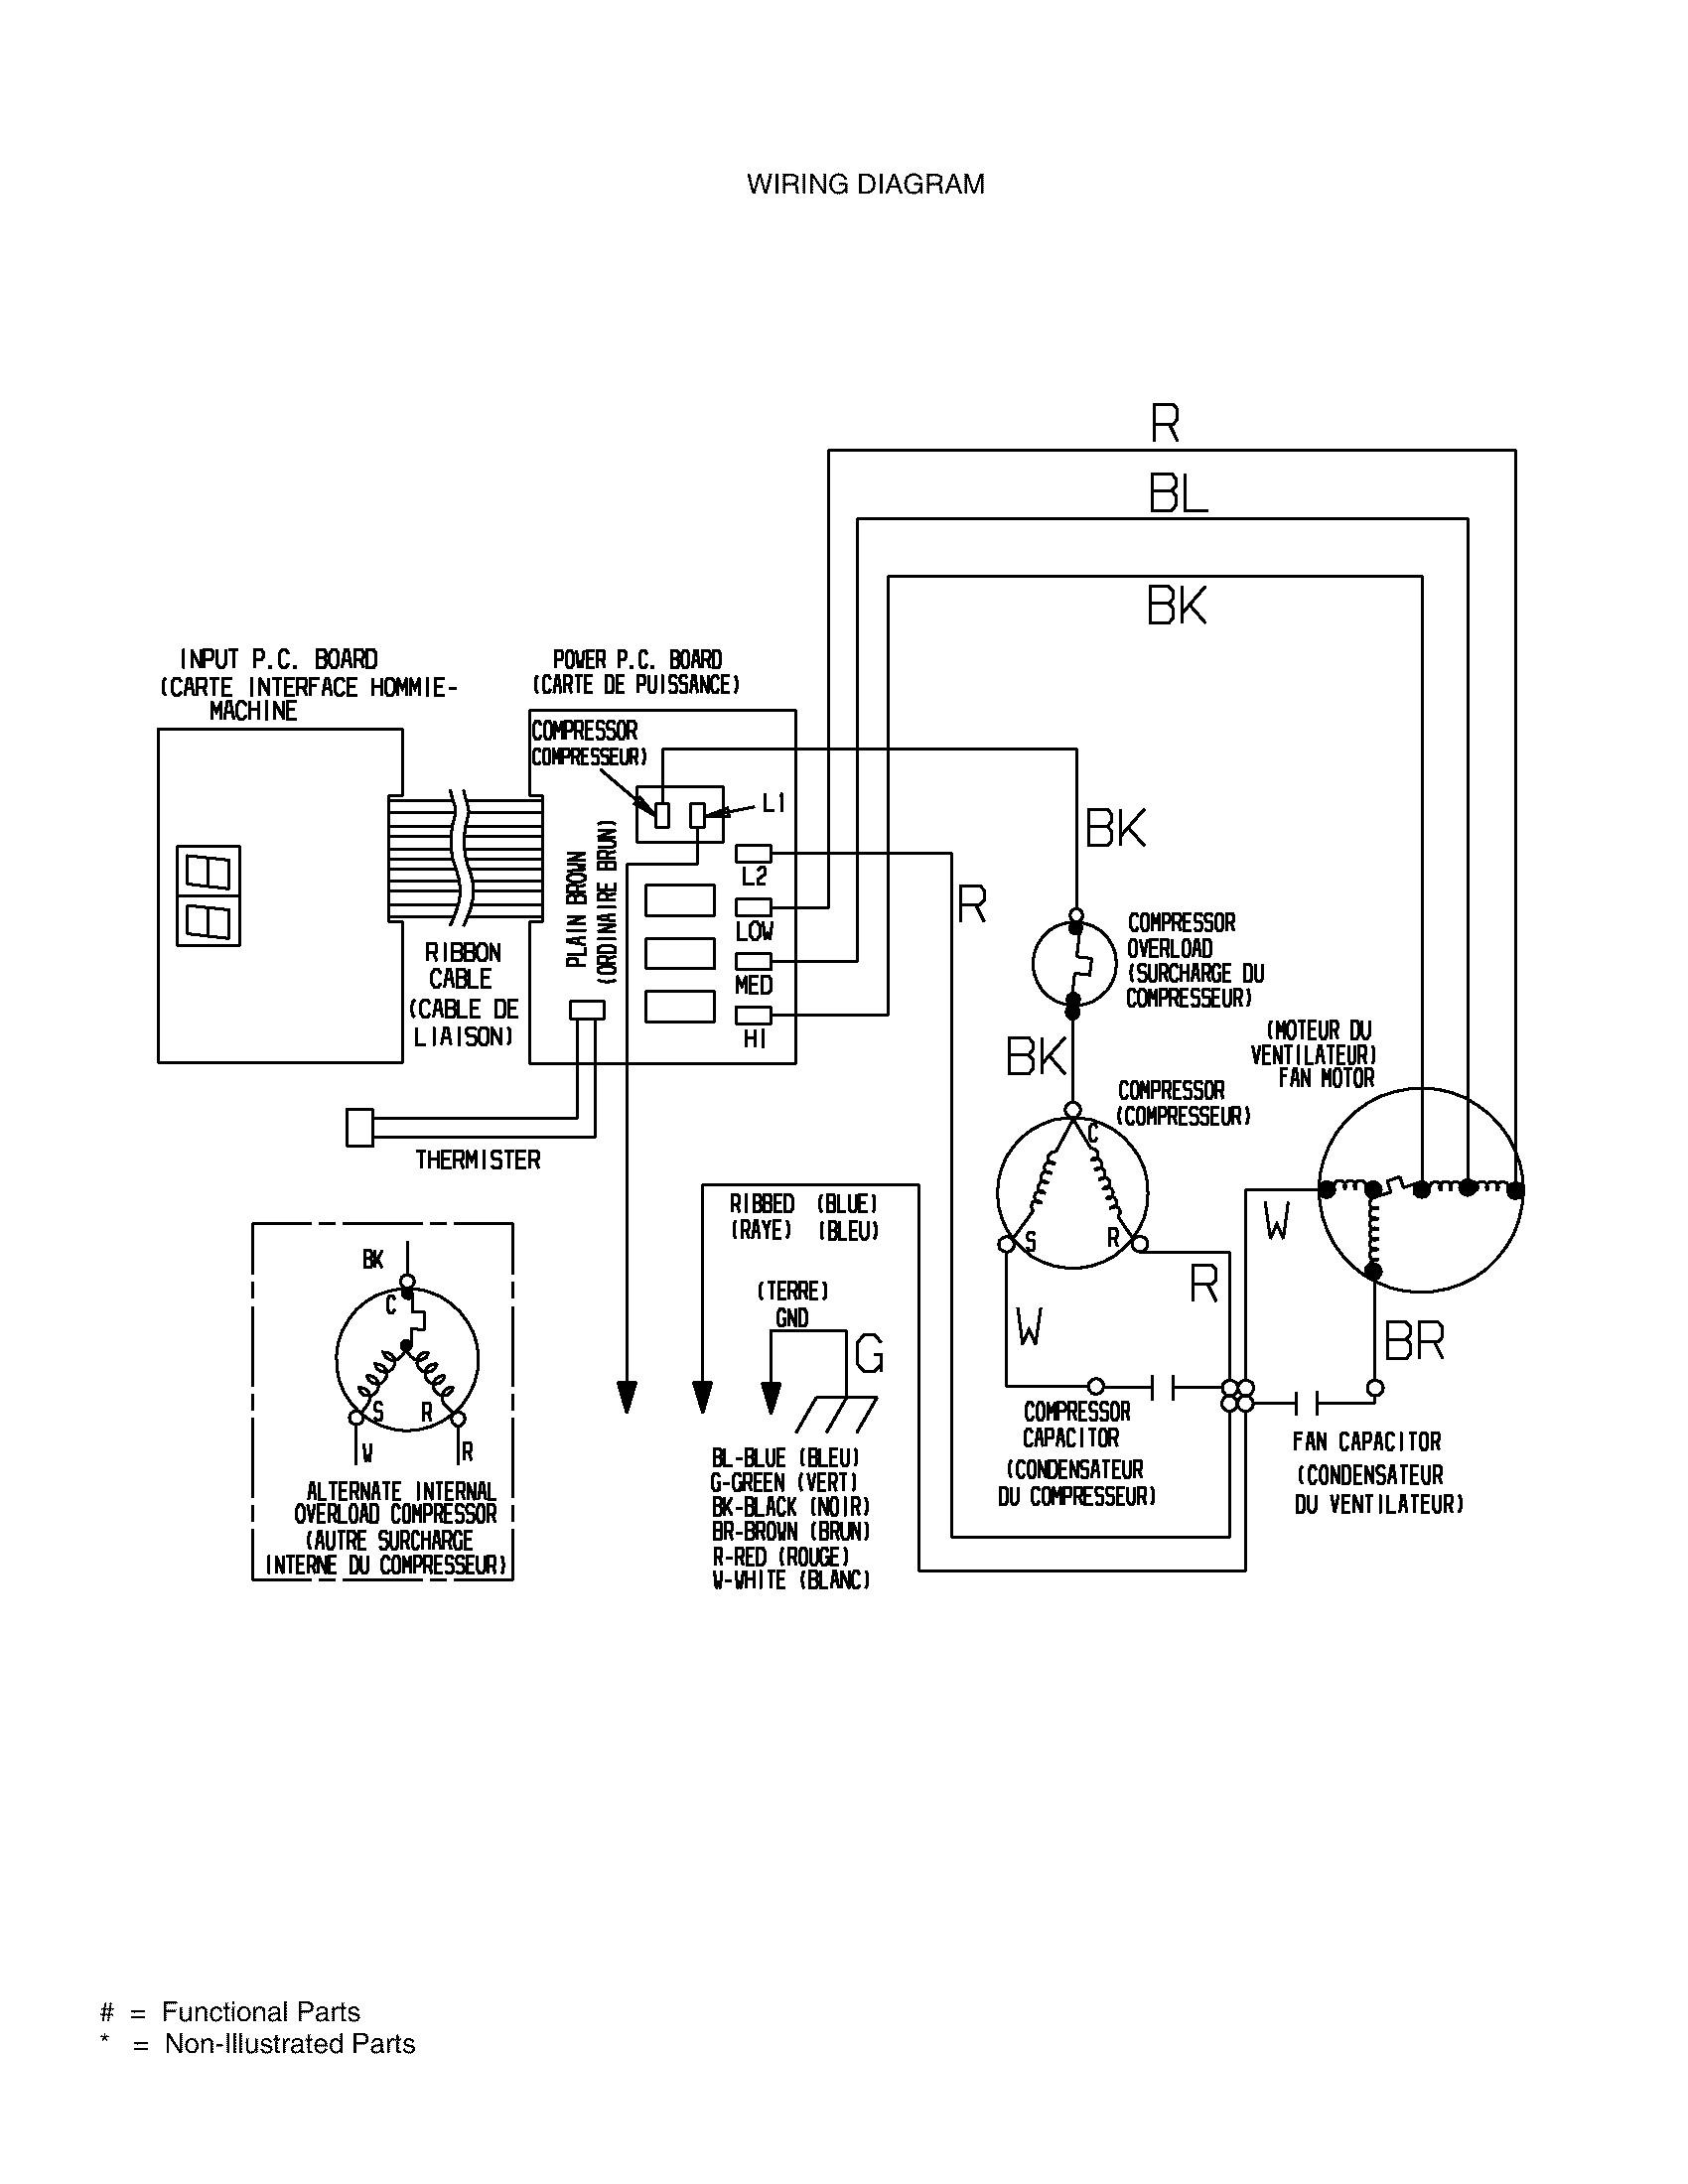 Diagram Of Auto Ac System Coleman Rv Air Conditioner Wiring Diagram – Wire Diagram Of Diagram Of Auto Ac System